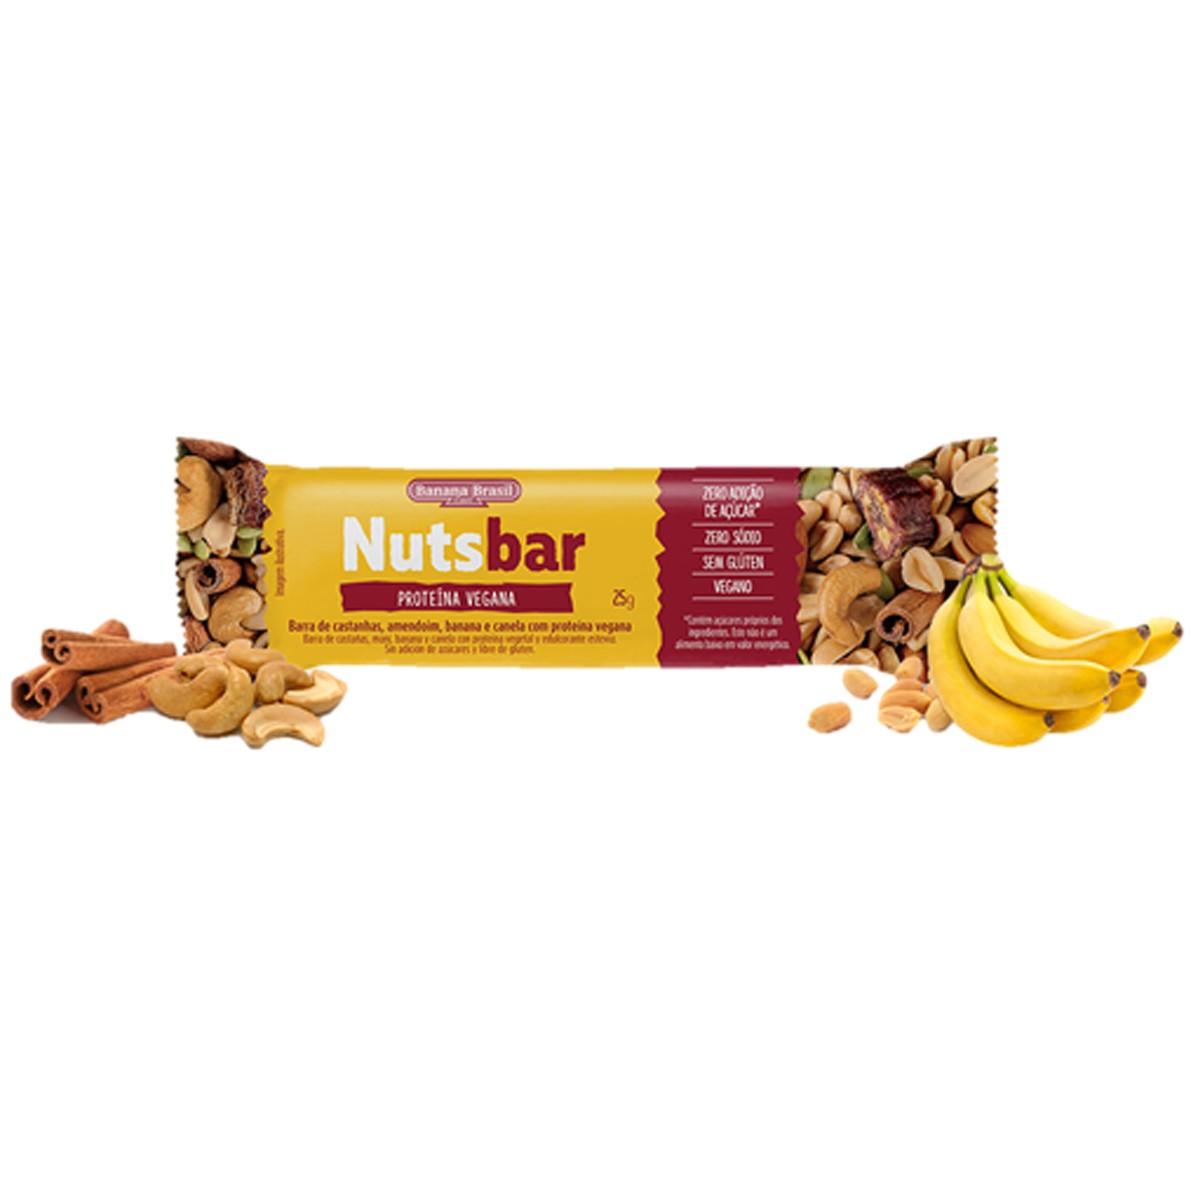 Nutsbar com Proteina Vegana 25g - Banana Brasil